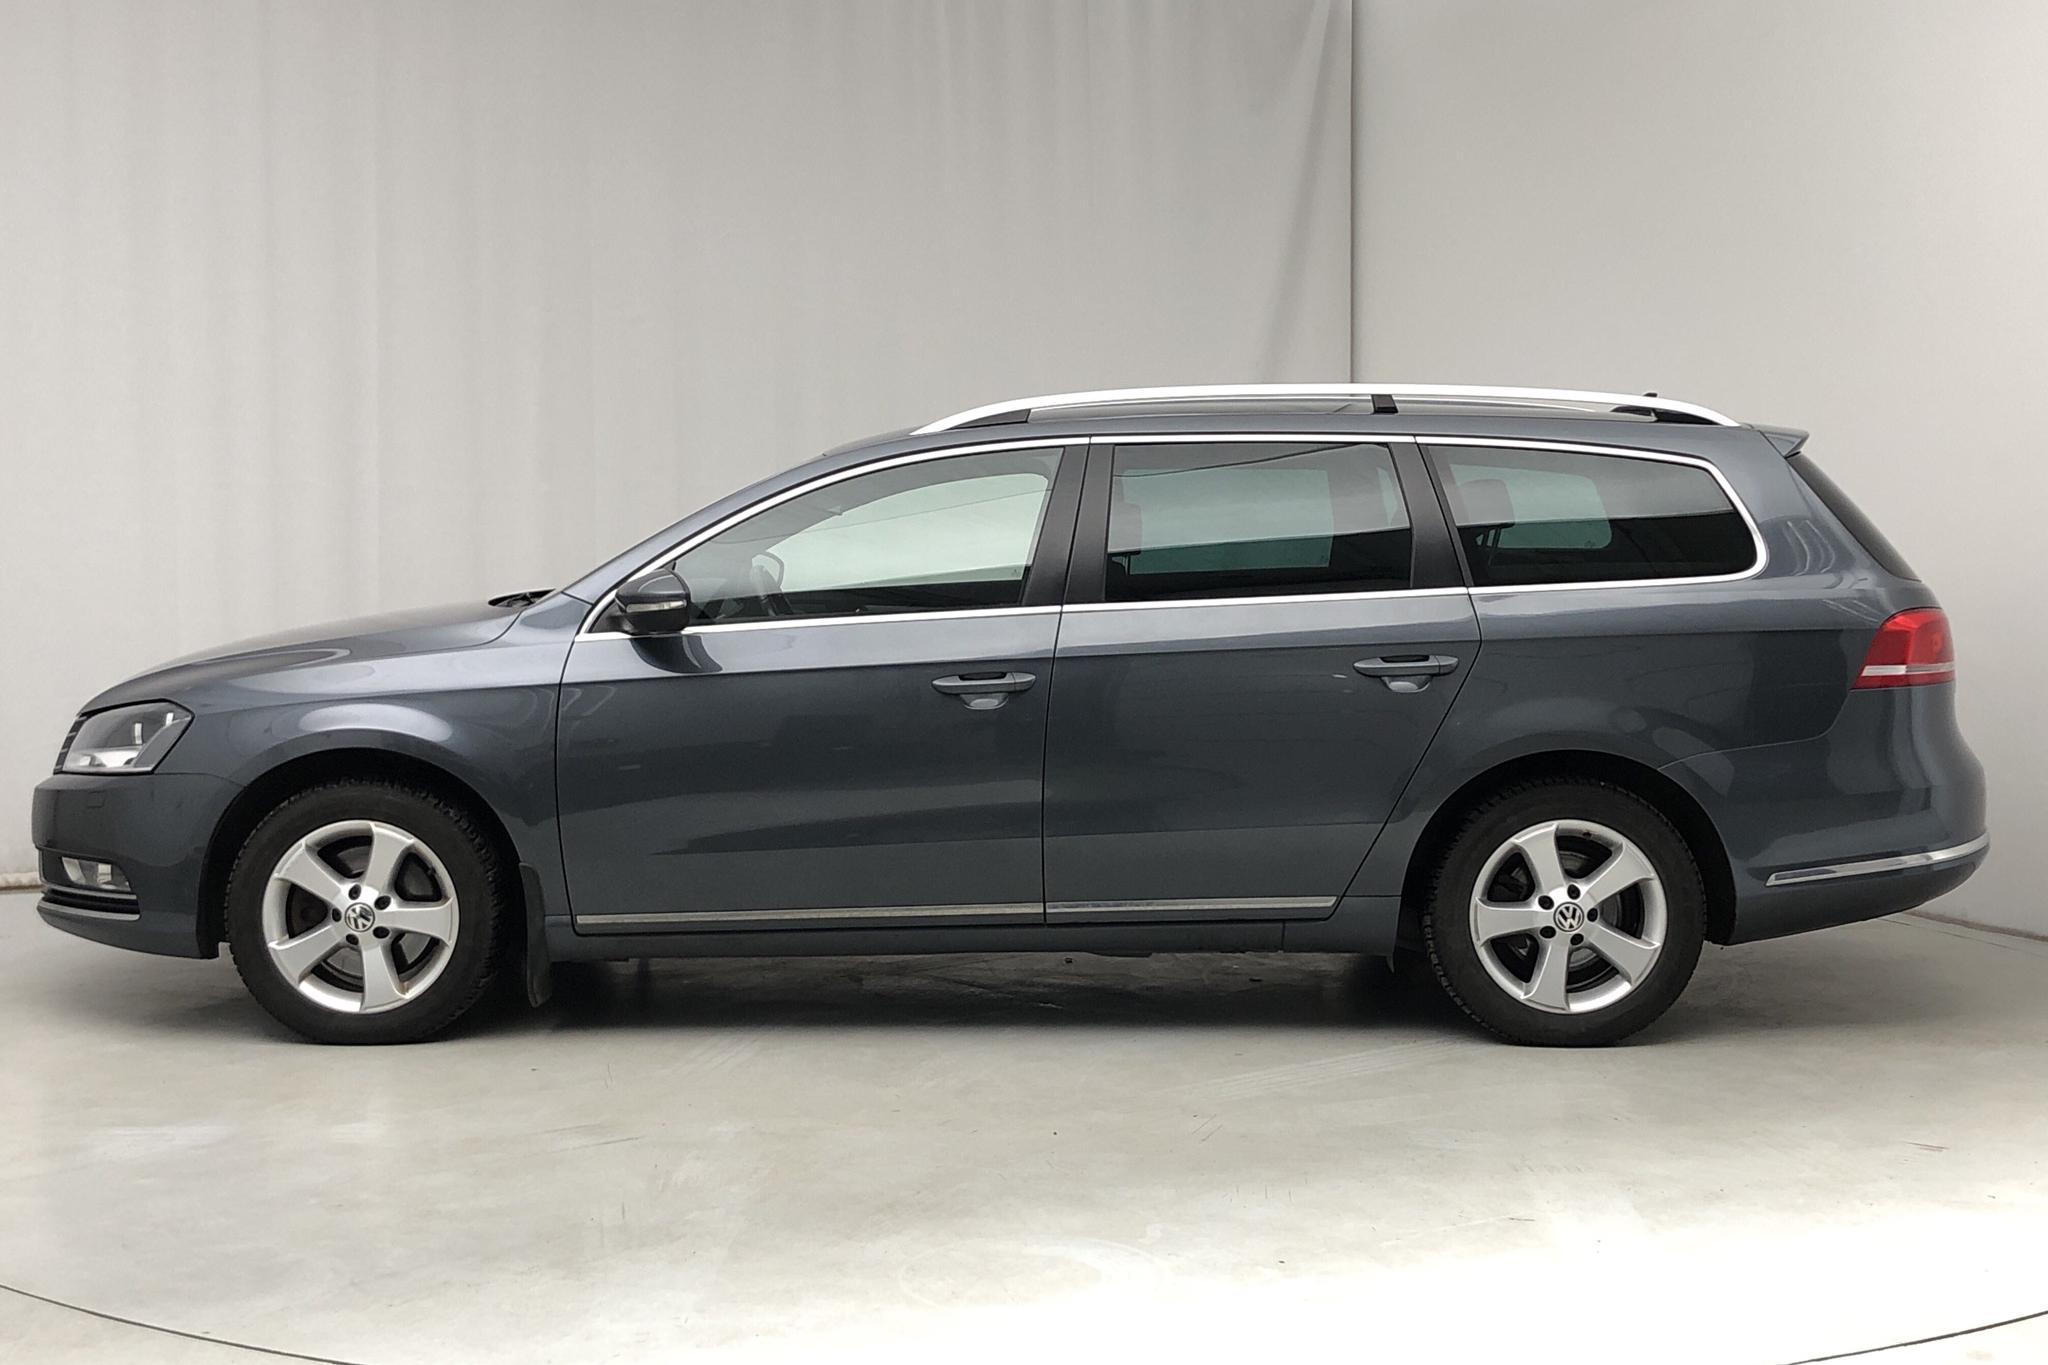 VW Passat 1.4 TSI EcoFuel Variant (150hk) - 173 680 km - Automatic - Dark Grey - 2015